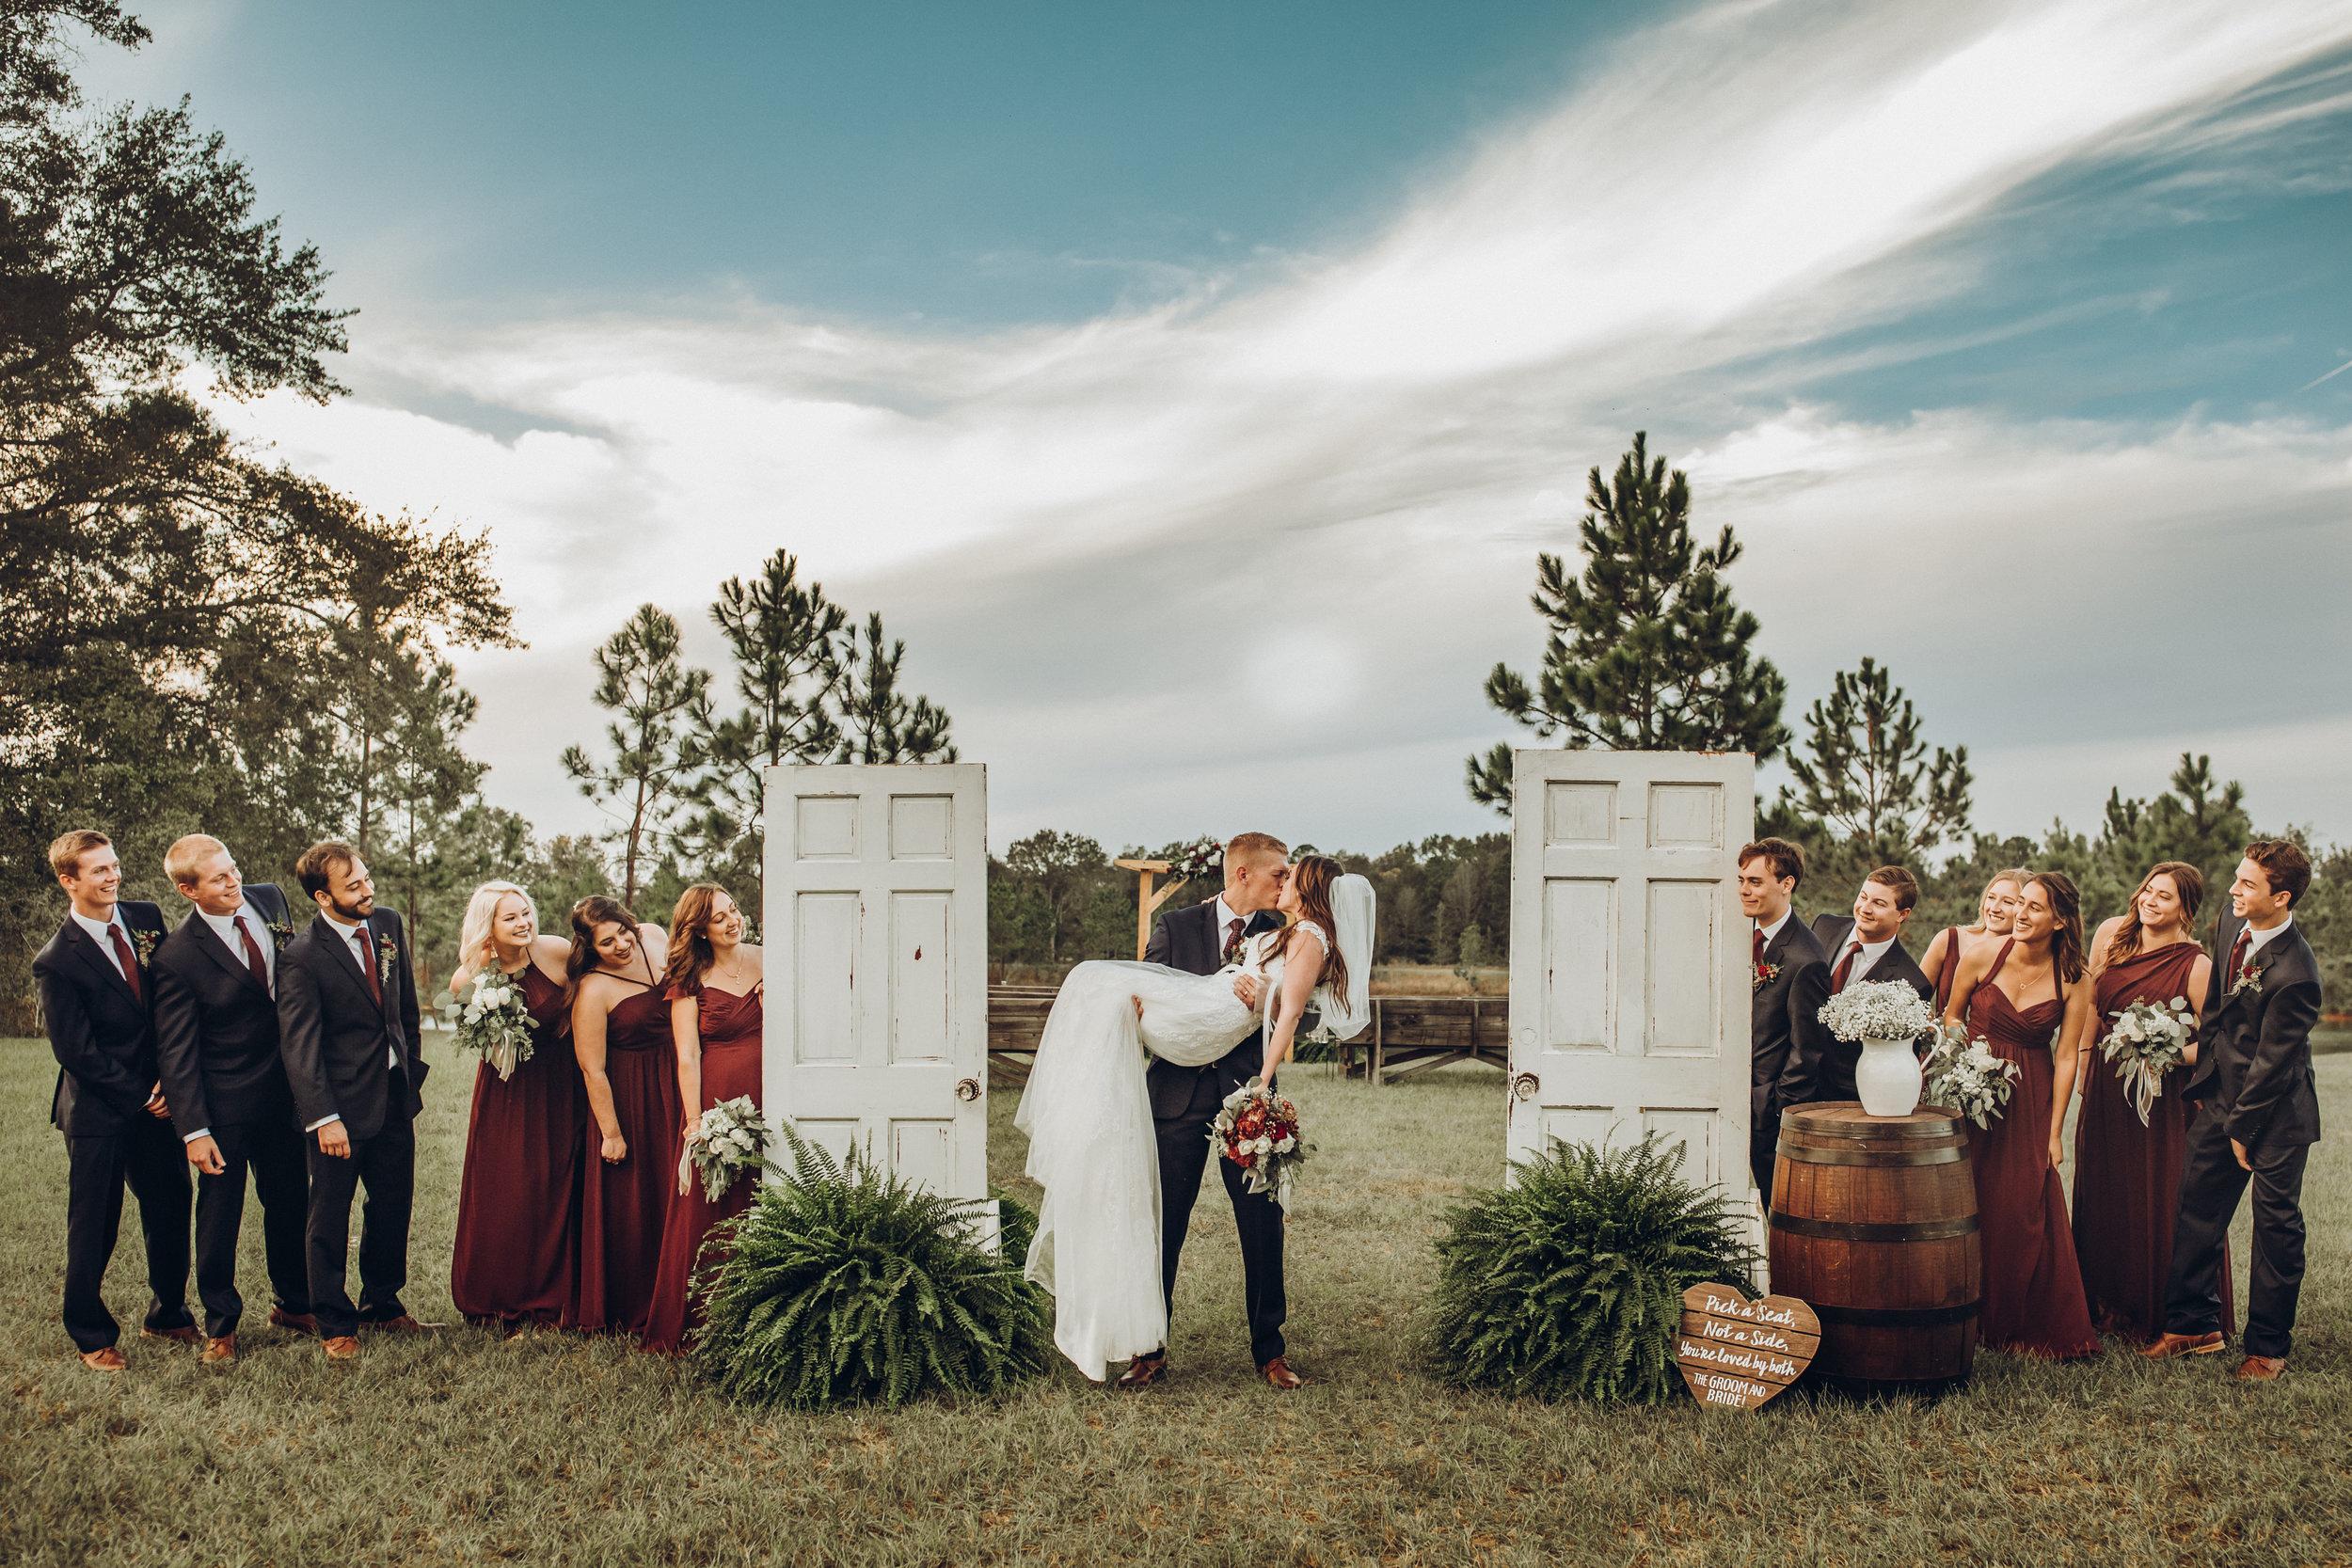 6. Bridal Party - Romantic Backyard Farm Wedding - Lauren+Daniel 017.jpg